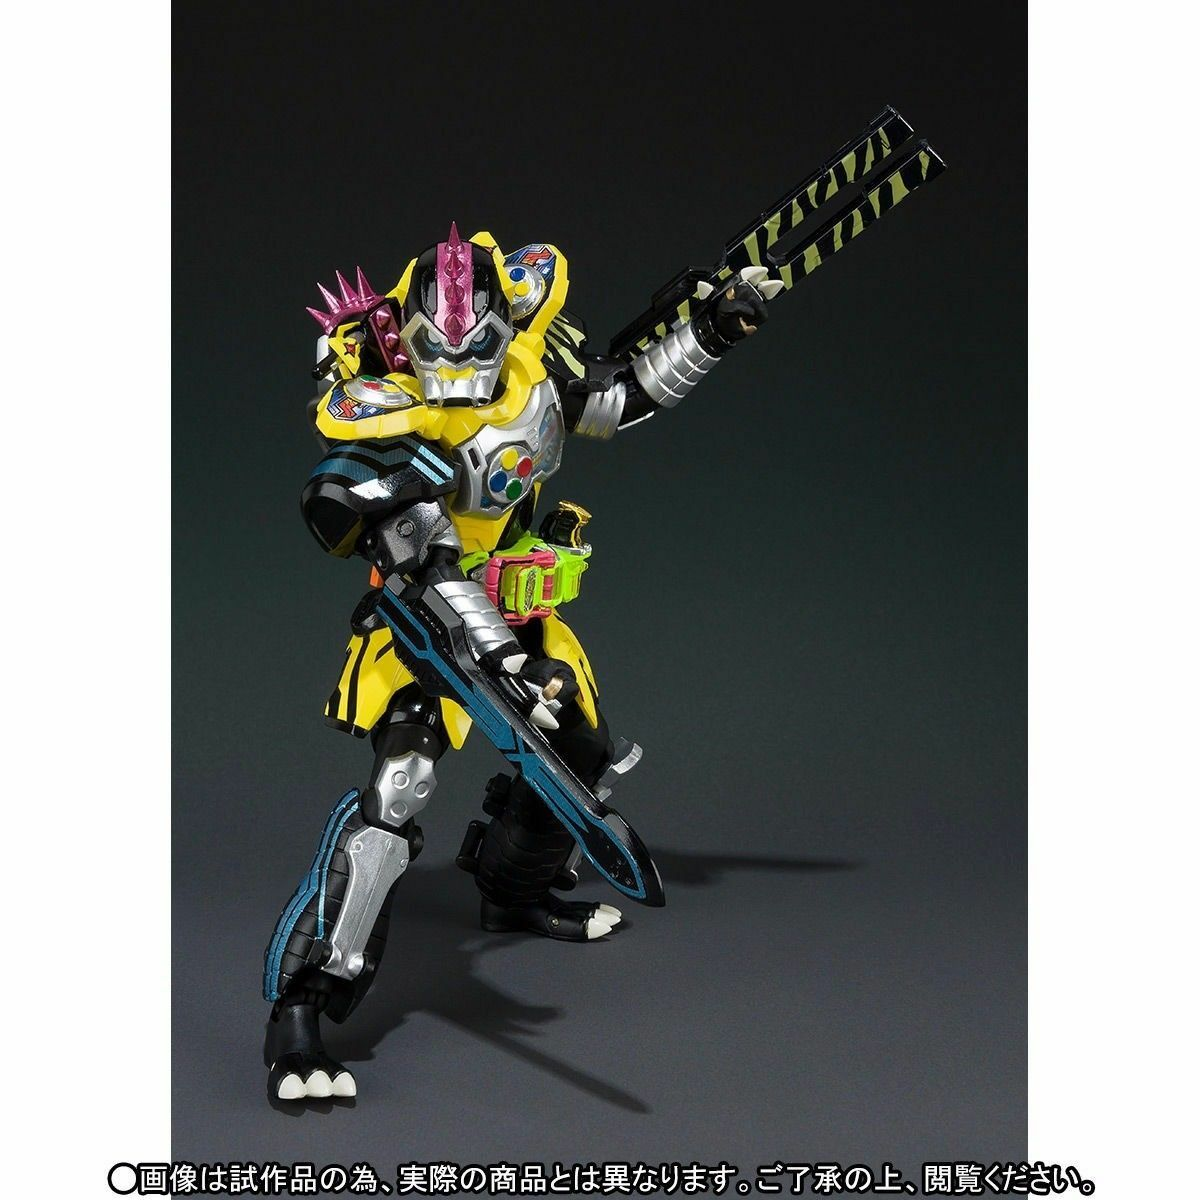 S.H.Figuarts Masked Kamen Rider EX-AID EX-AID EX-AID LAZER HUNTER BIKE GAMER LEVEL 5 BANDAI d92d1a